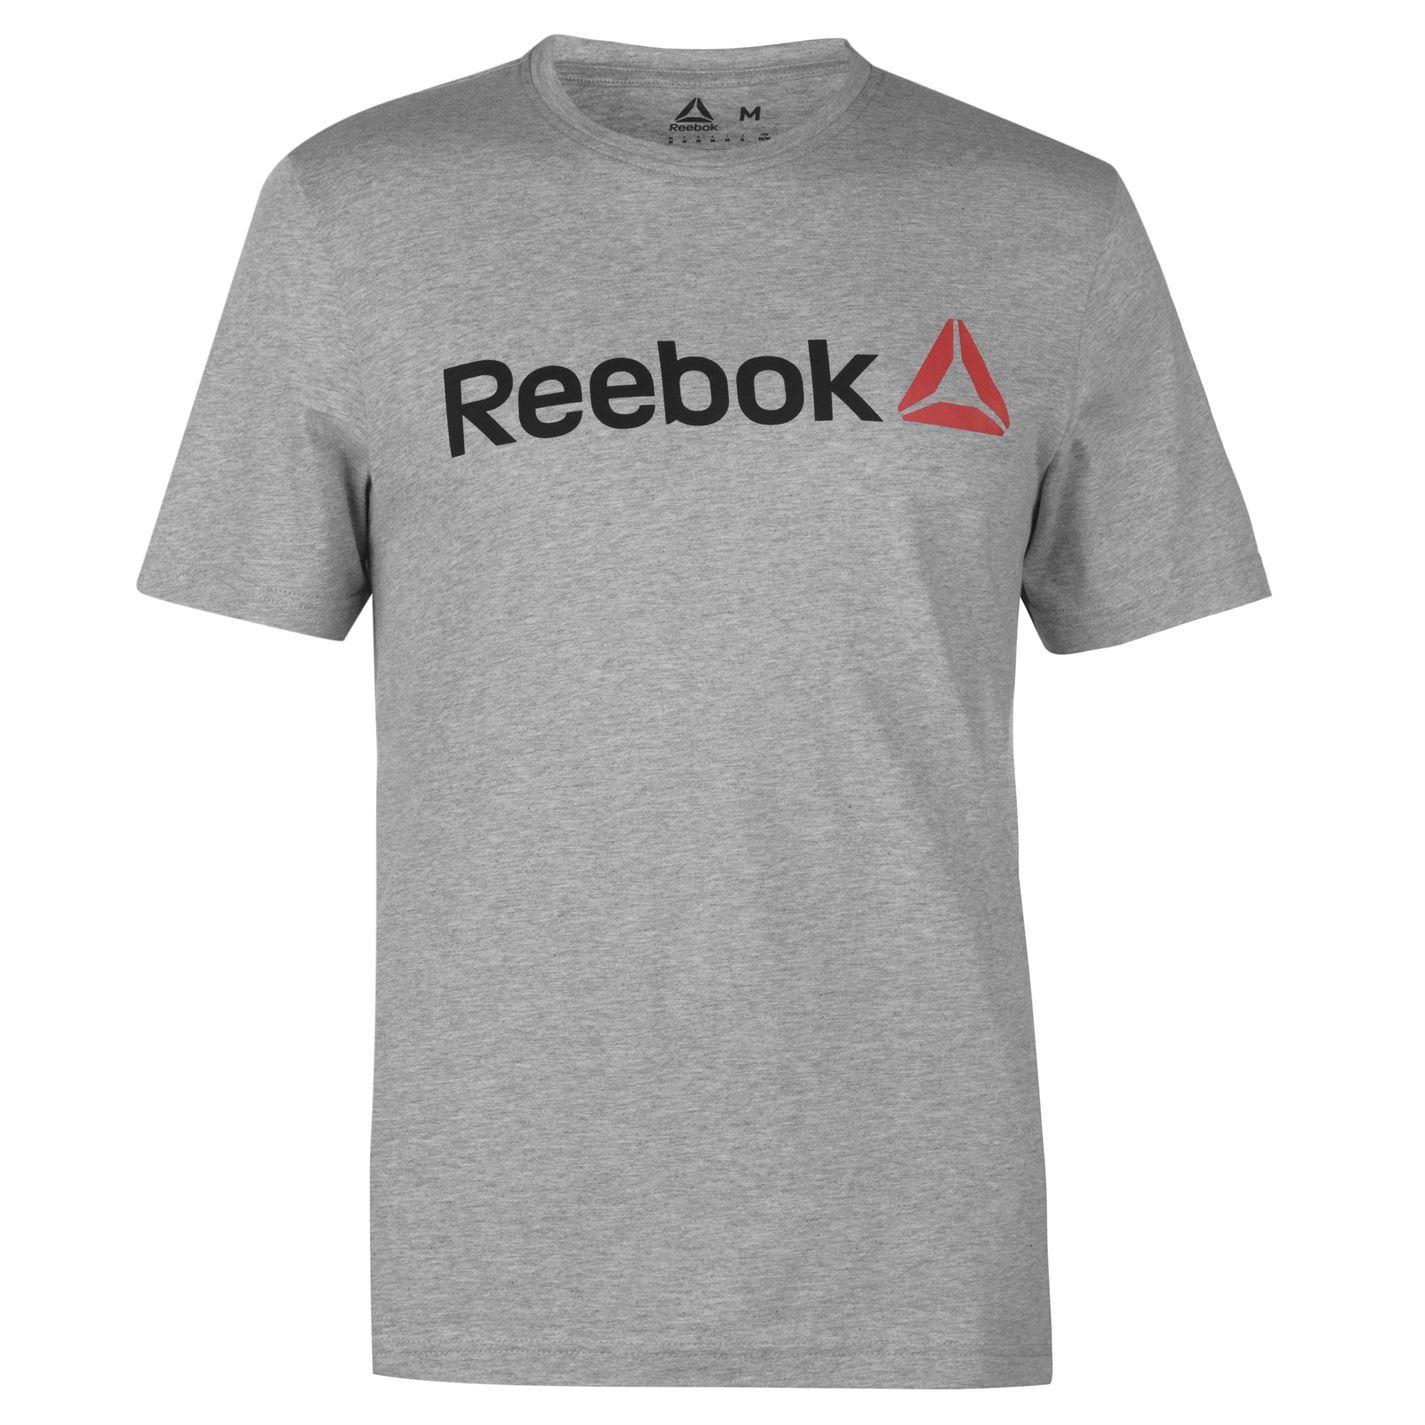 Reebok-Delta-Logo-T-Shirt-Mens-Tee-Shirt-Top thumbnail 24